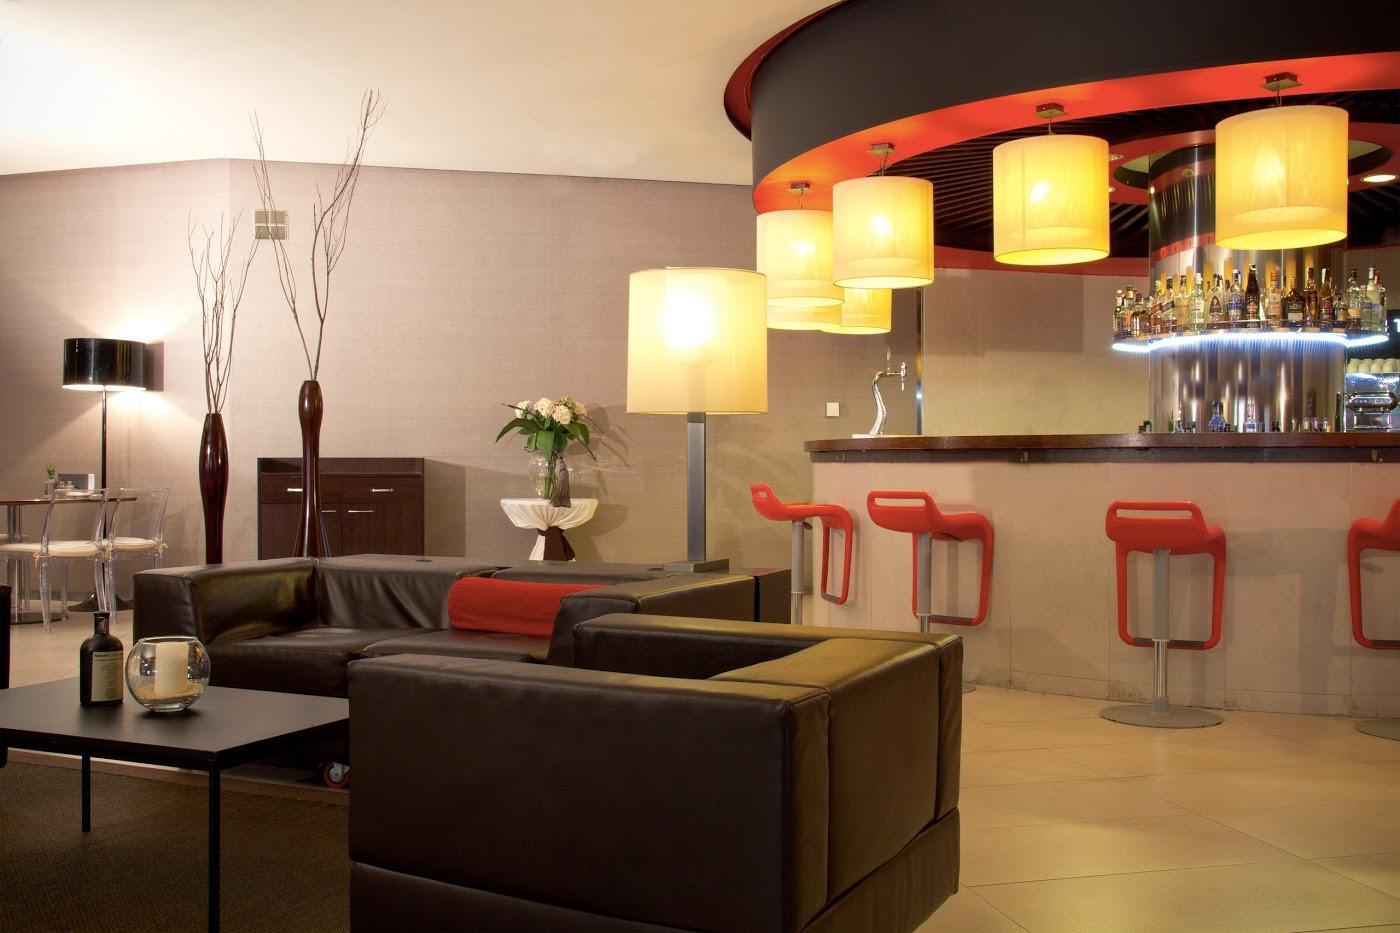 Hotel barcelo costa vasca en san sebasti n viajes carrefour for Hoteles con habitaciones familiares en san sebastian